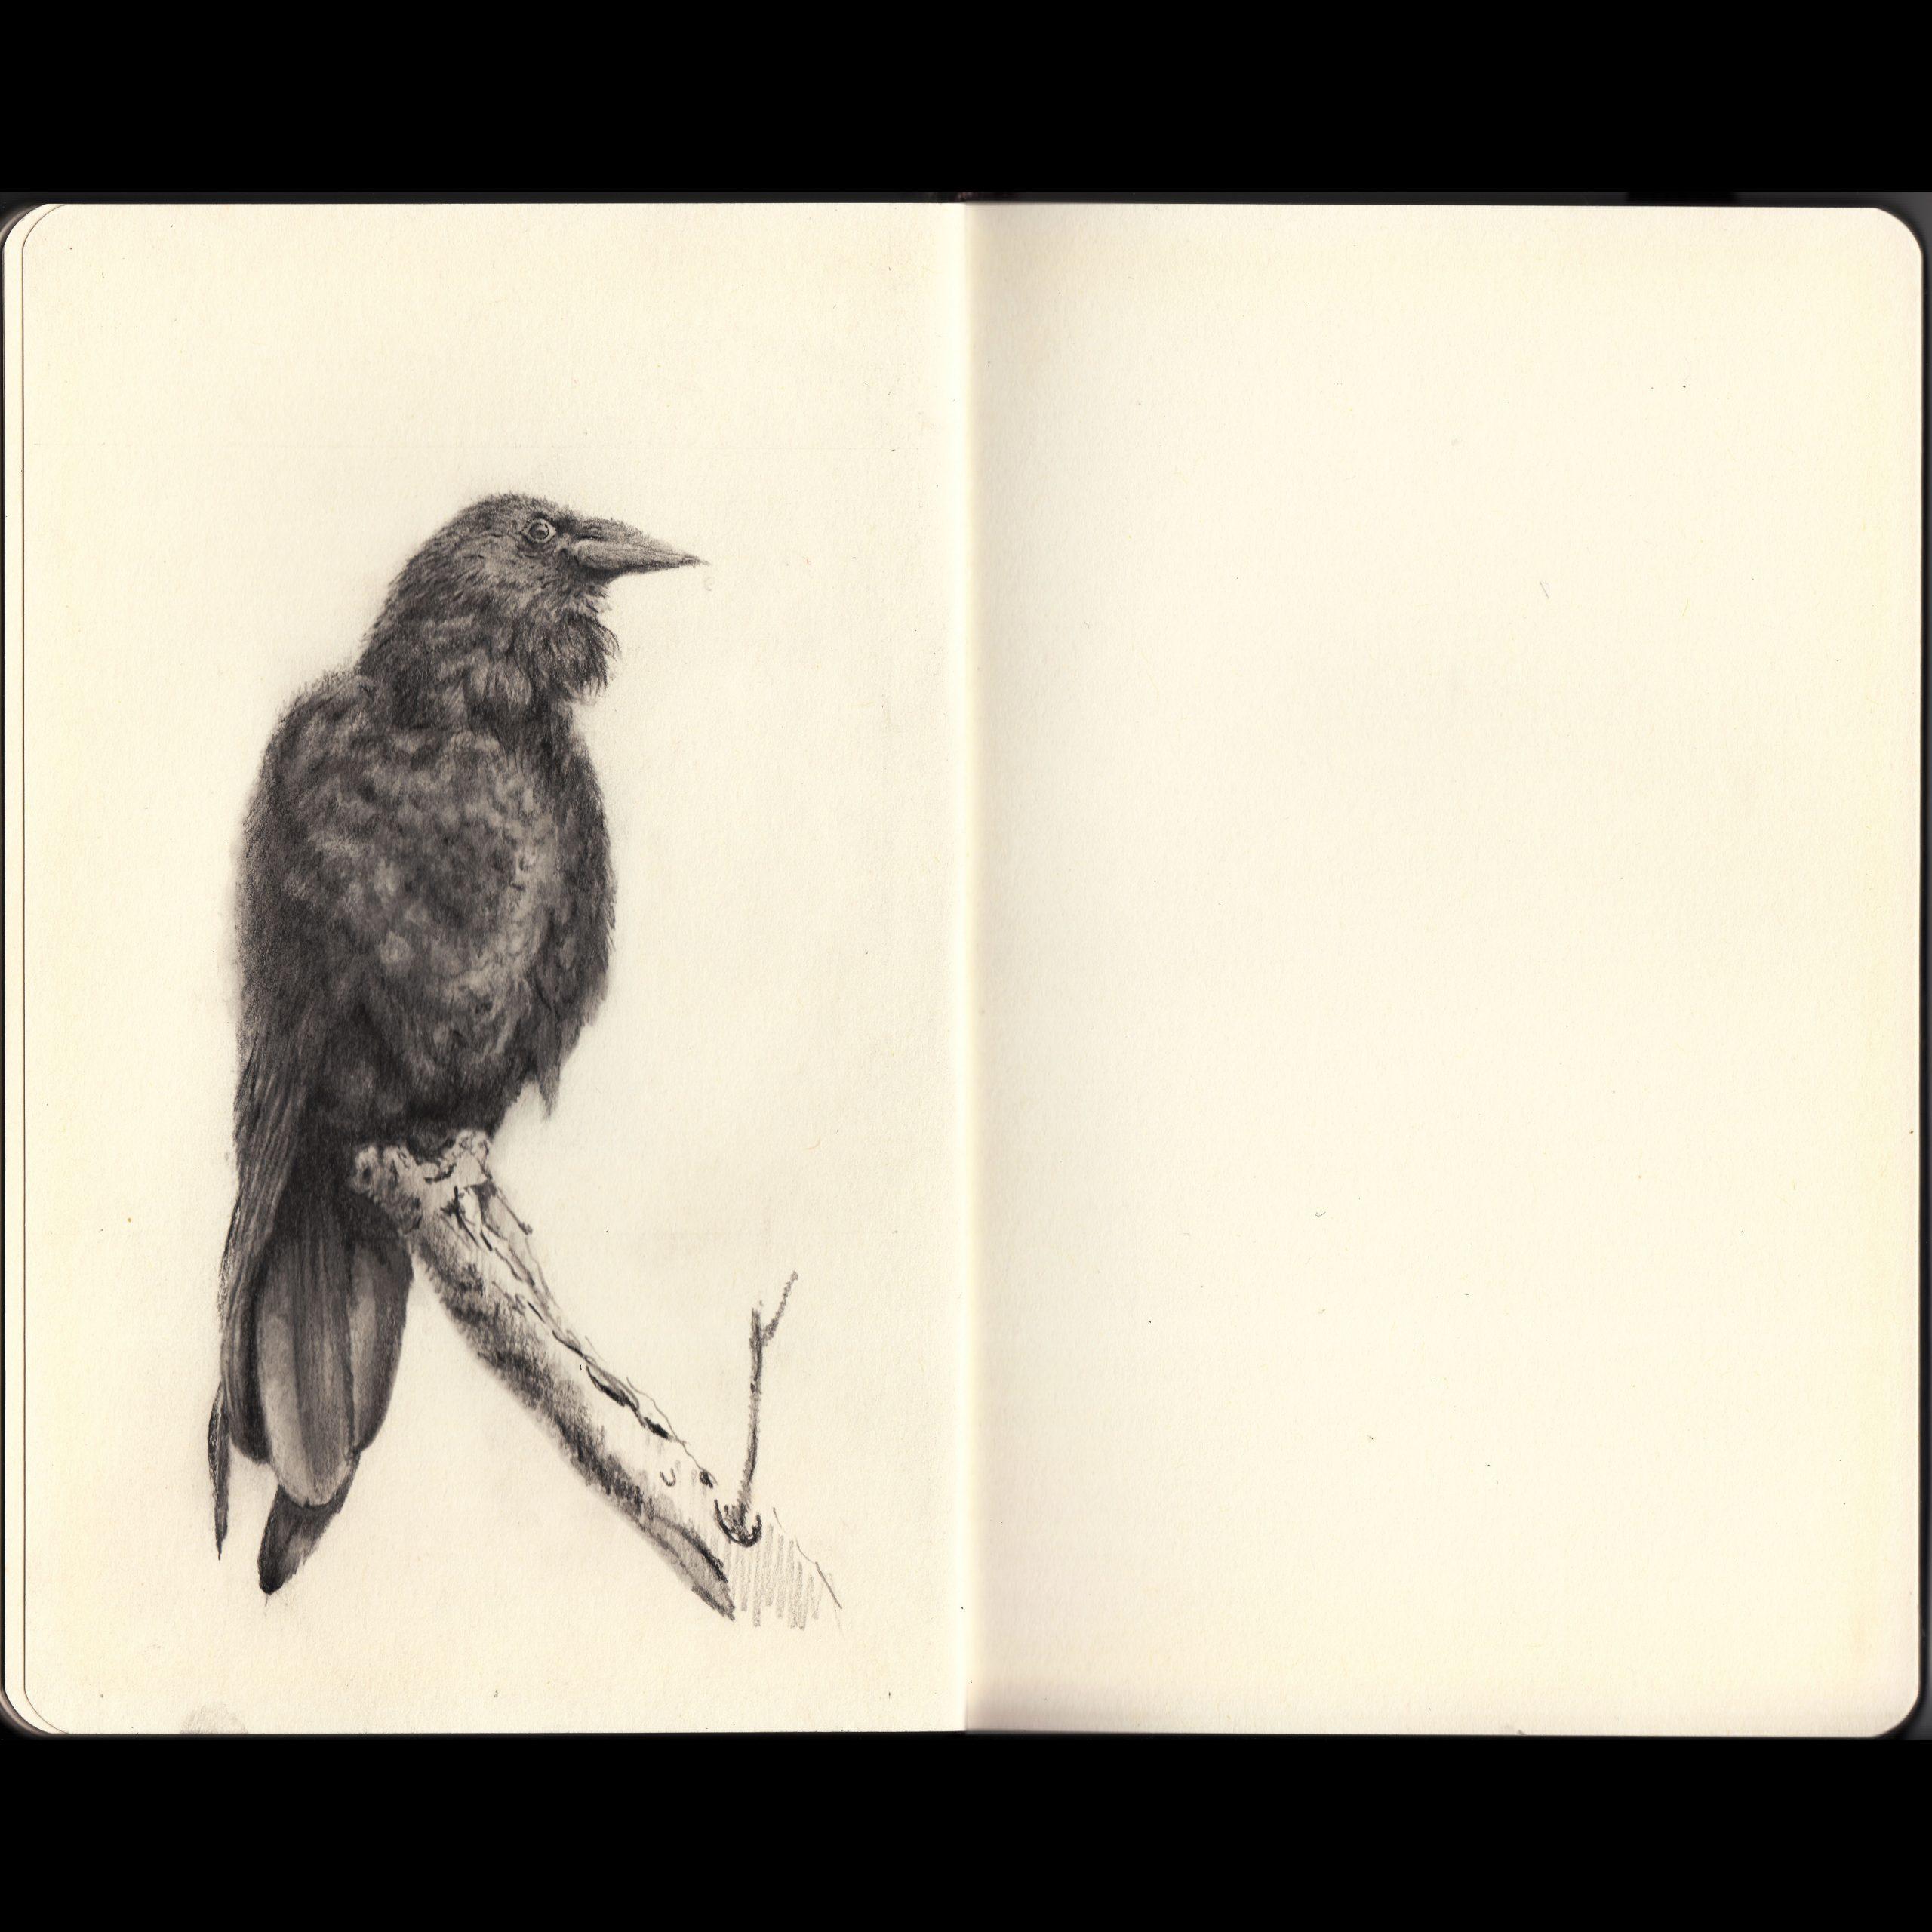 A Study of Bird 2/2